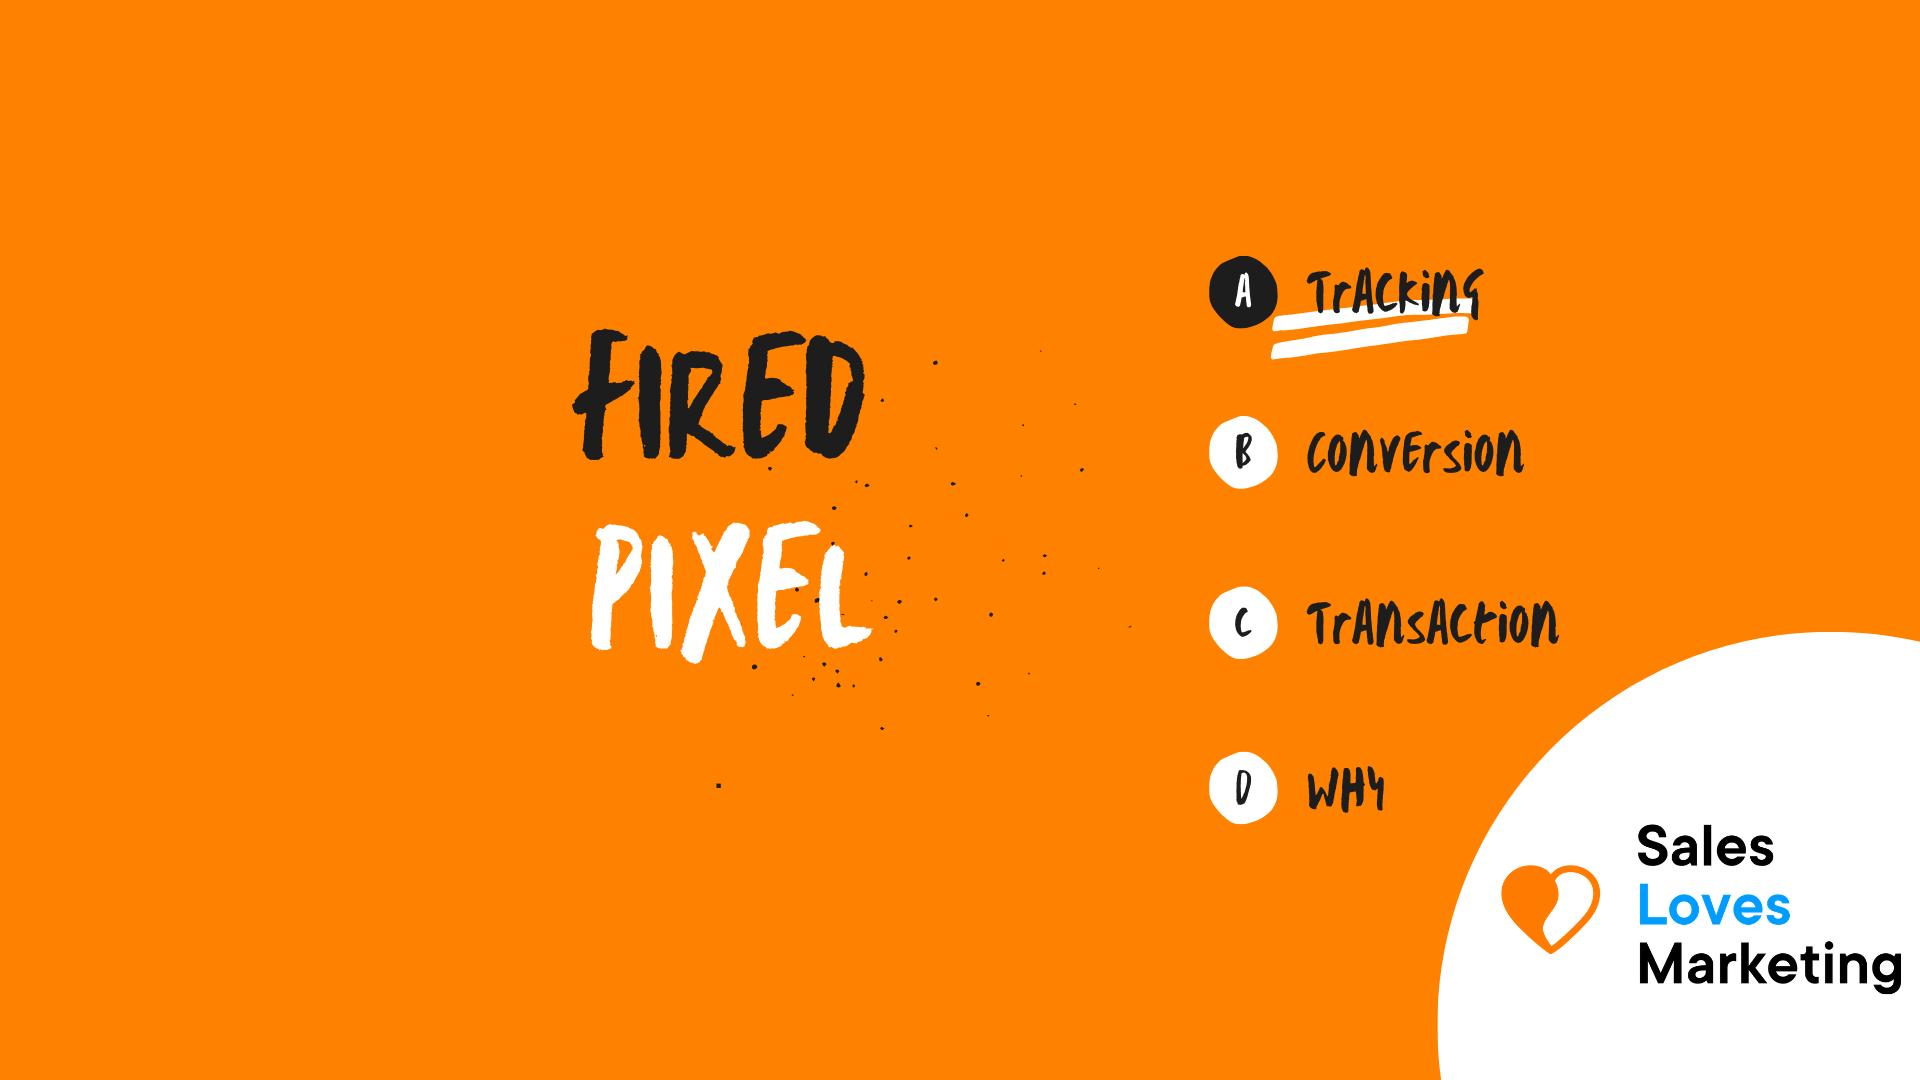 Fired Pixel